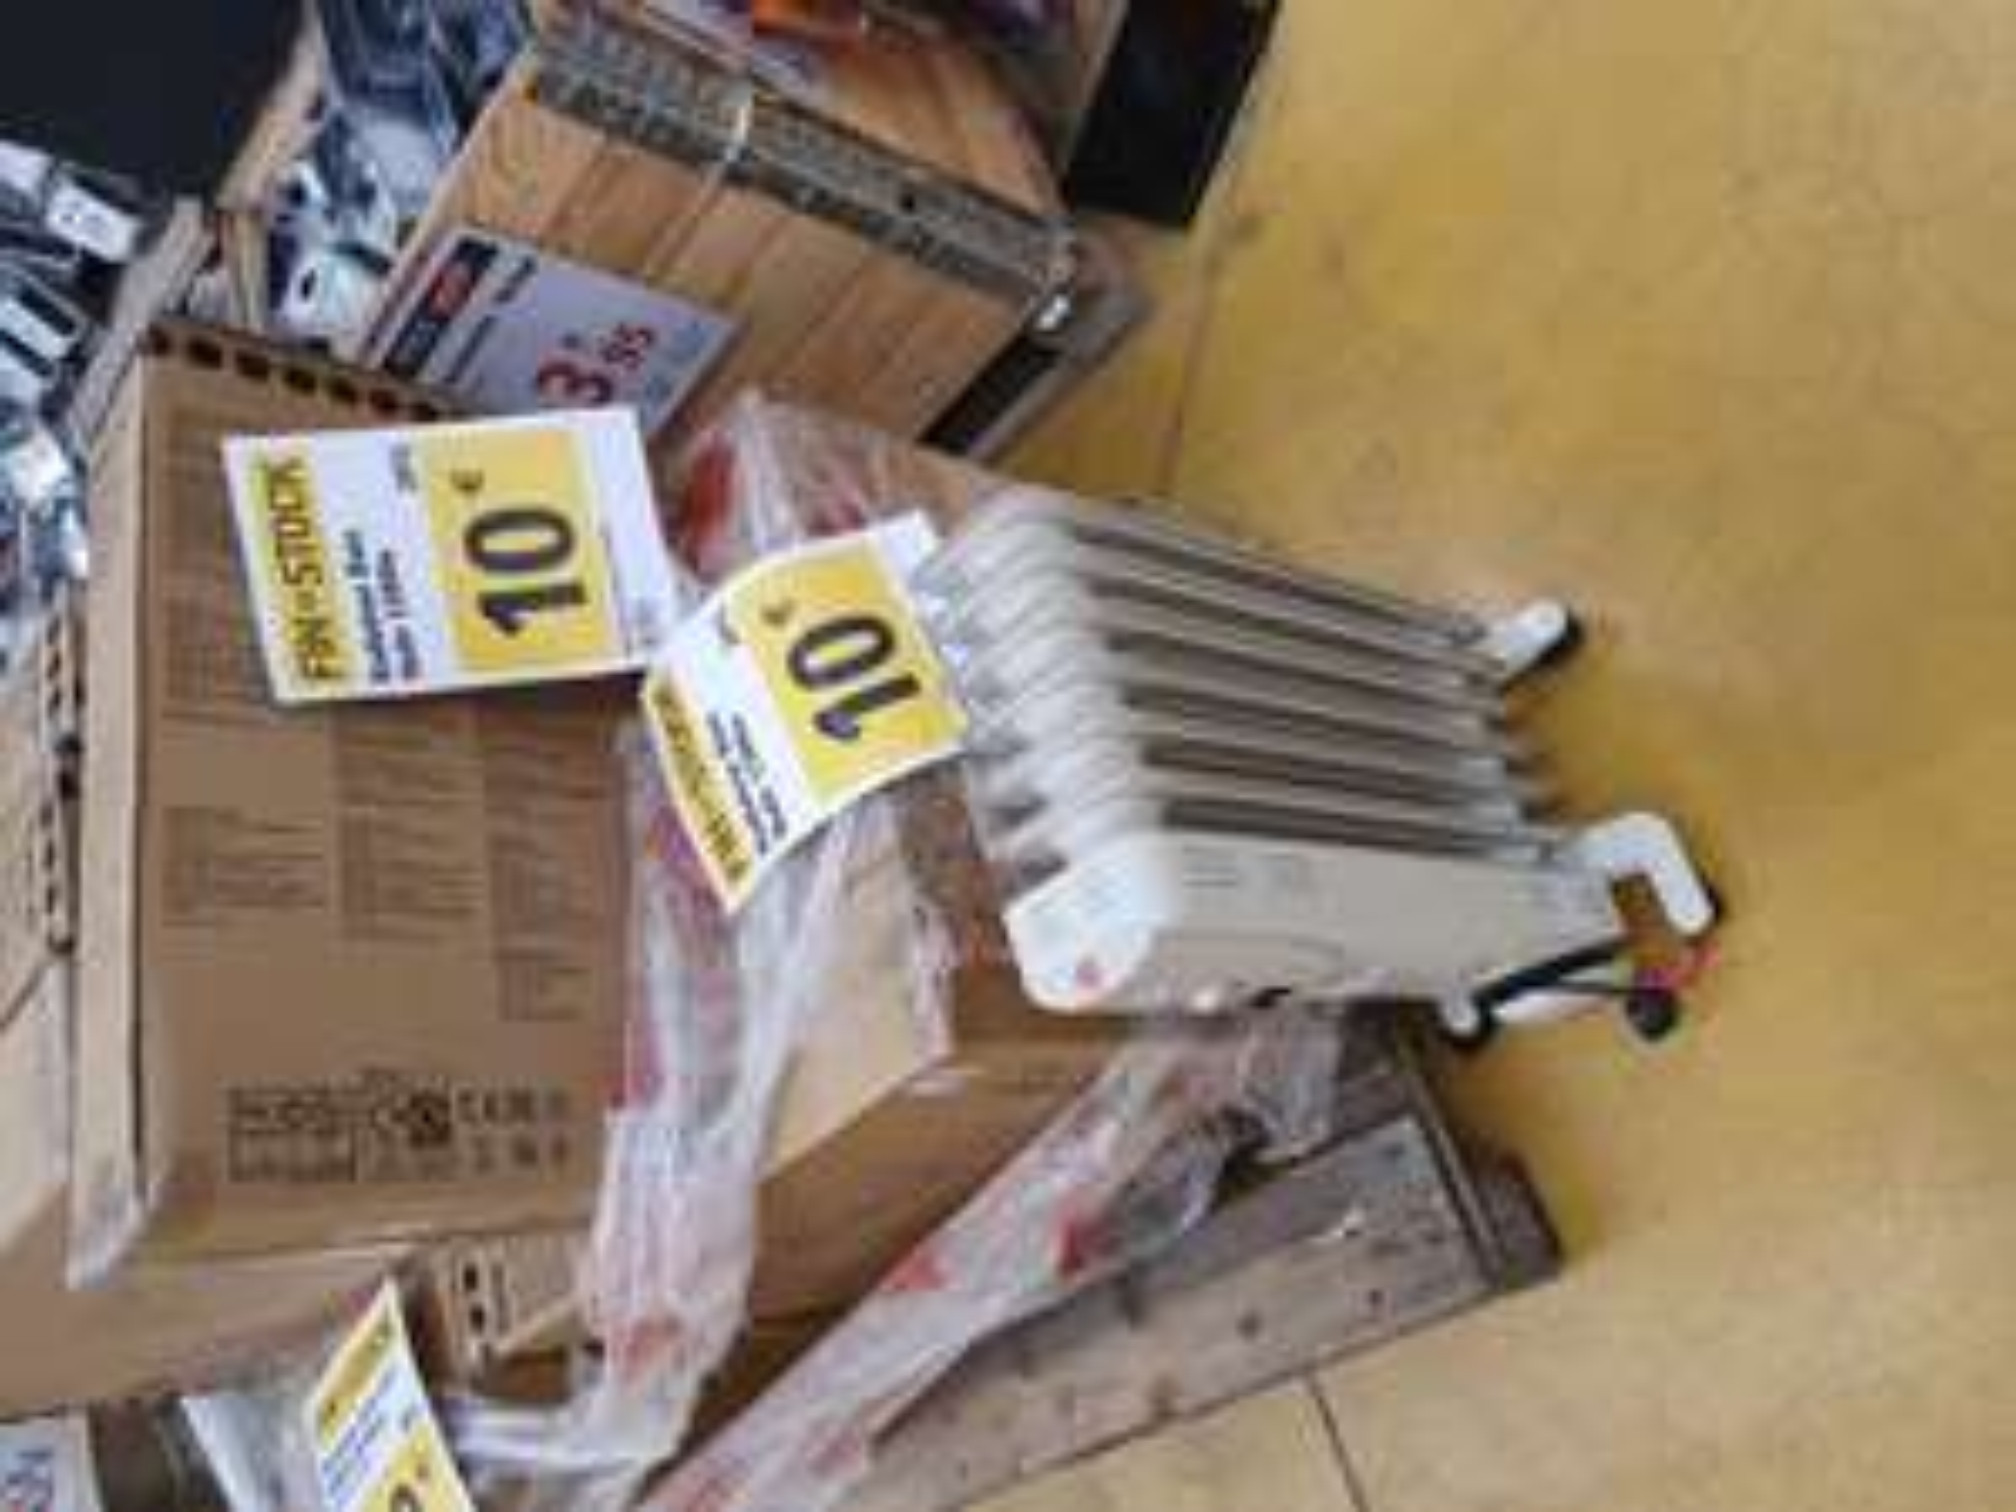 Bon Plan Ou Code Promo Radiateurs Offres Sur Dealabs